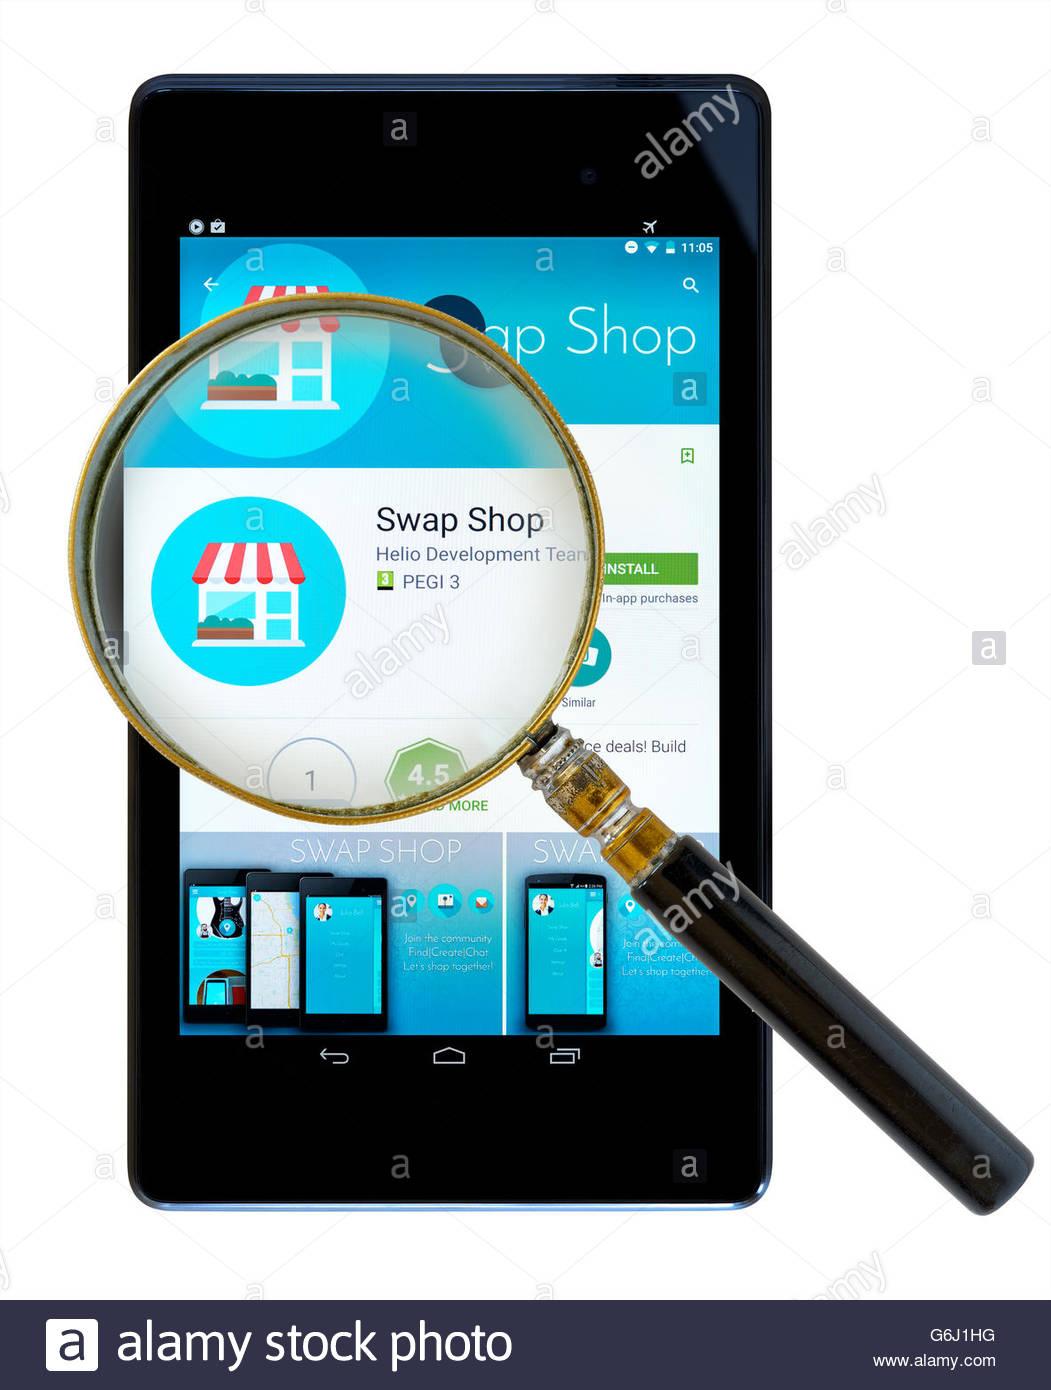 Swap Shop app shown on a tablet computer, Dorset, England